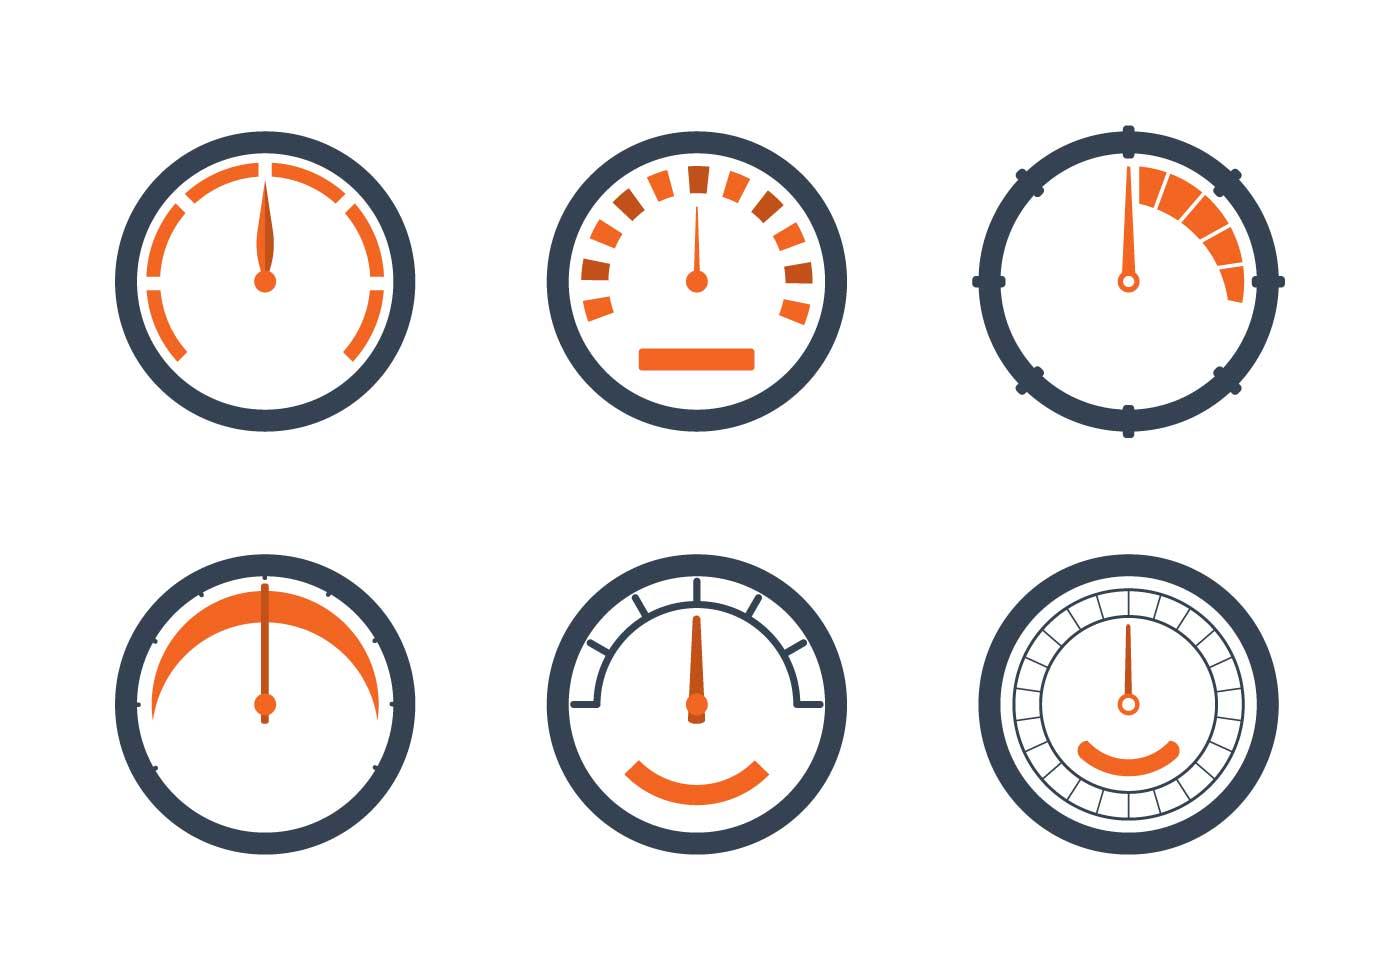 Tachometers Vector - Download Free Vector Art, Stock ... Tachometer Logo